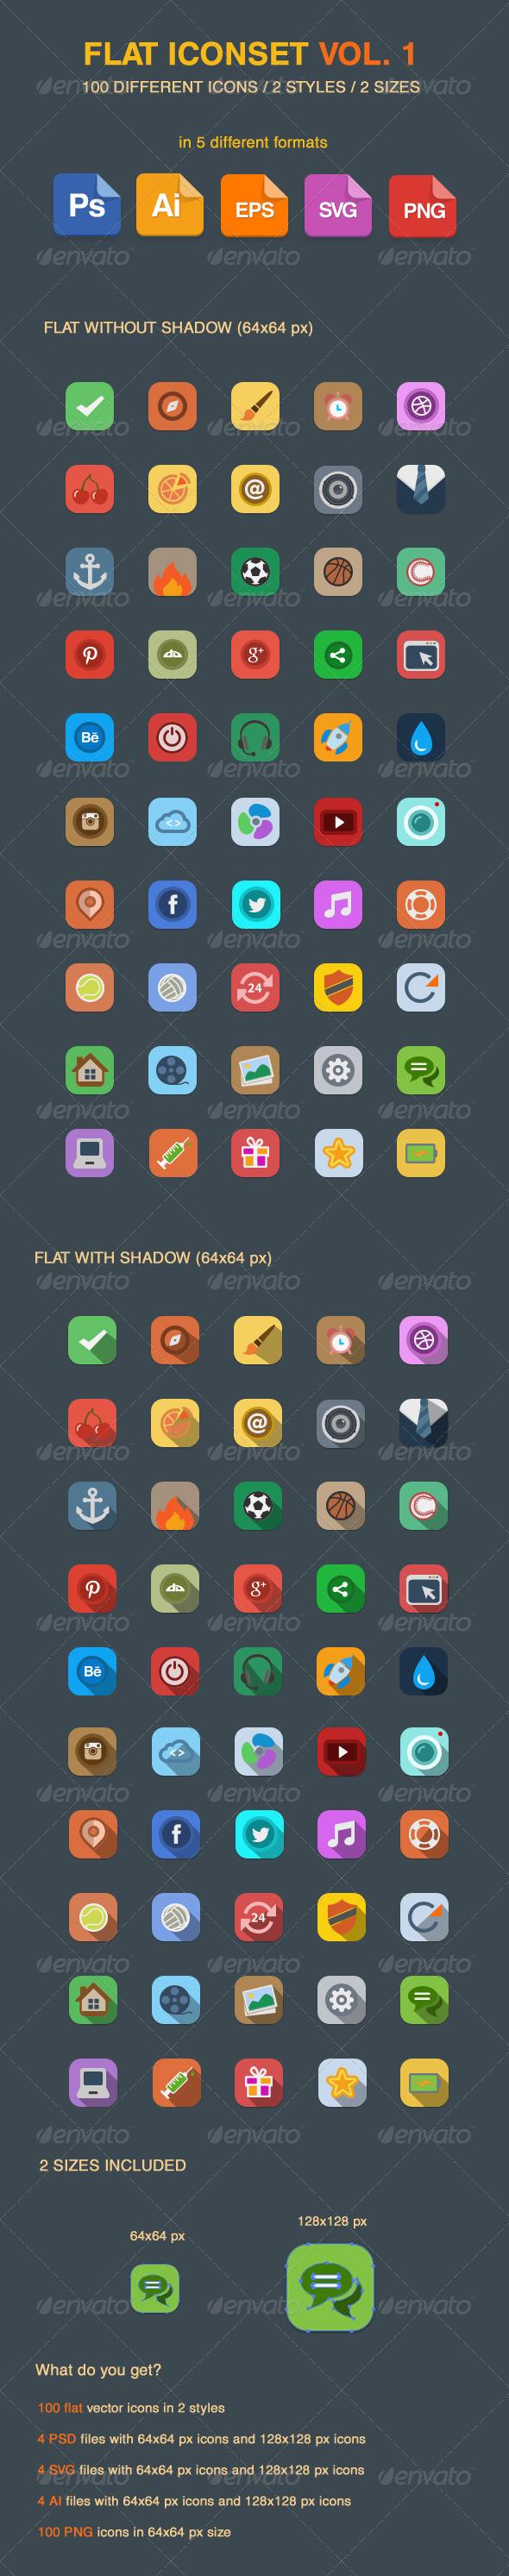 Flat Vector Iconset Vol 1 - Web Icons